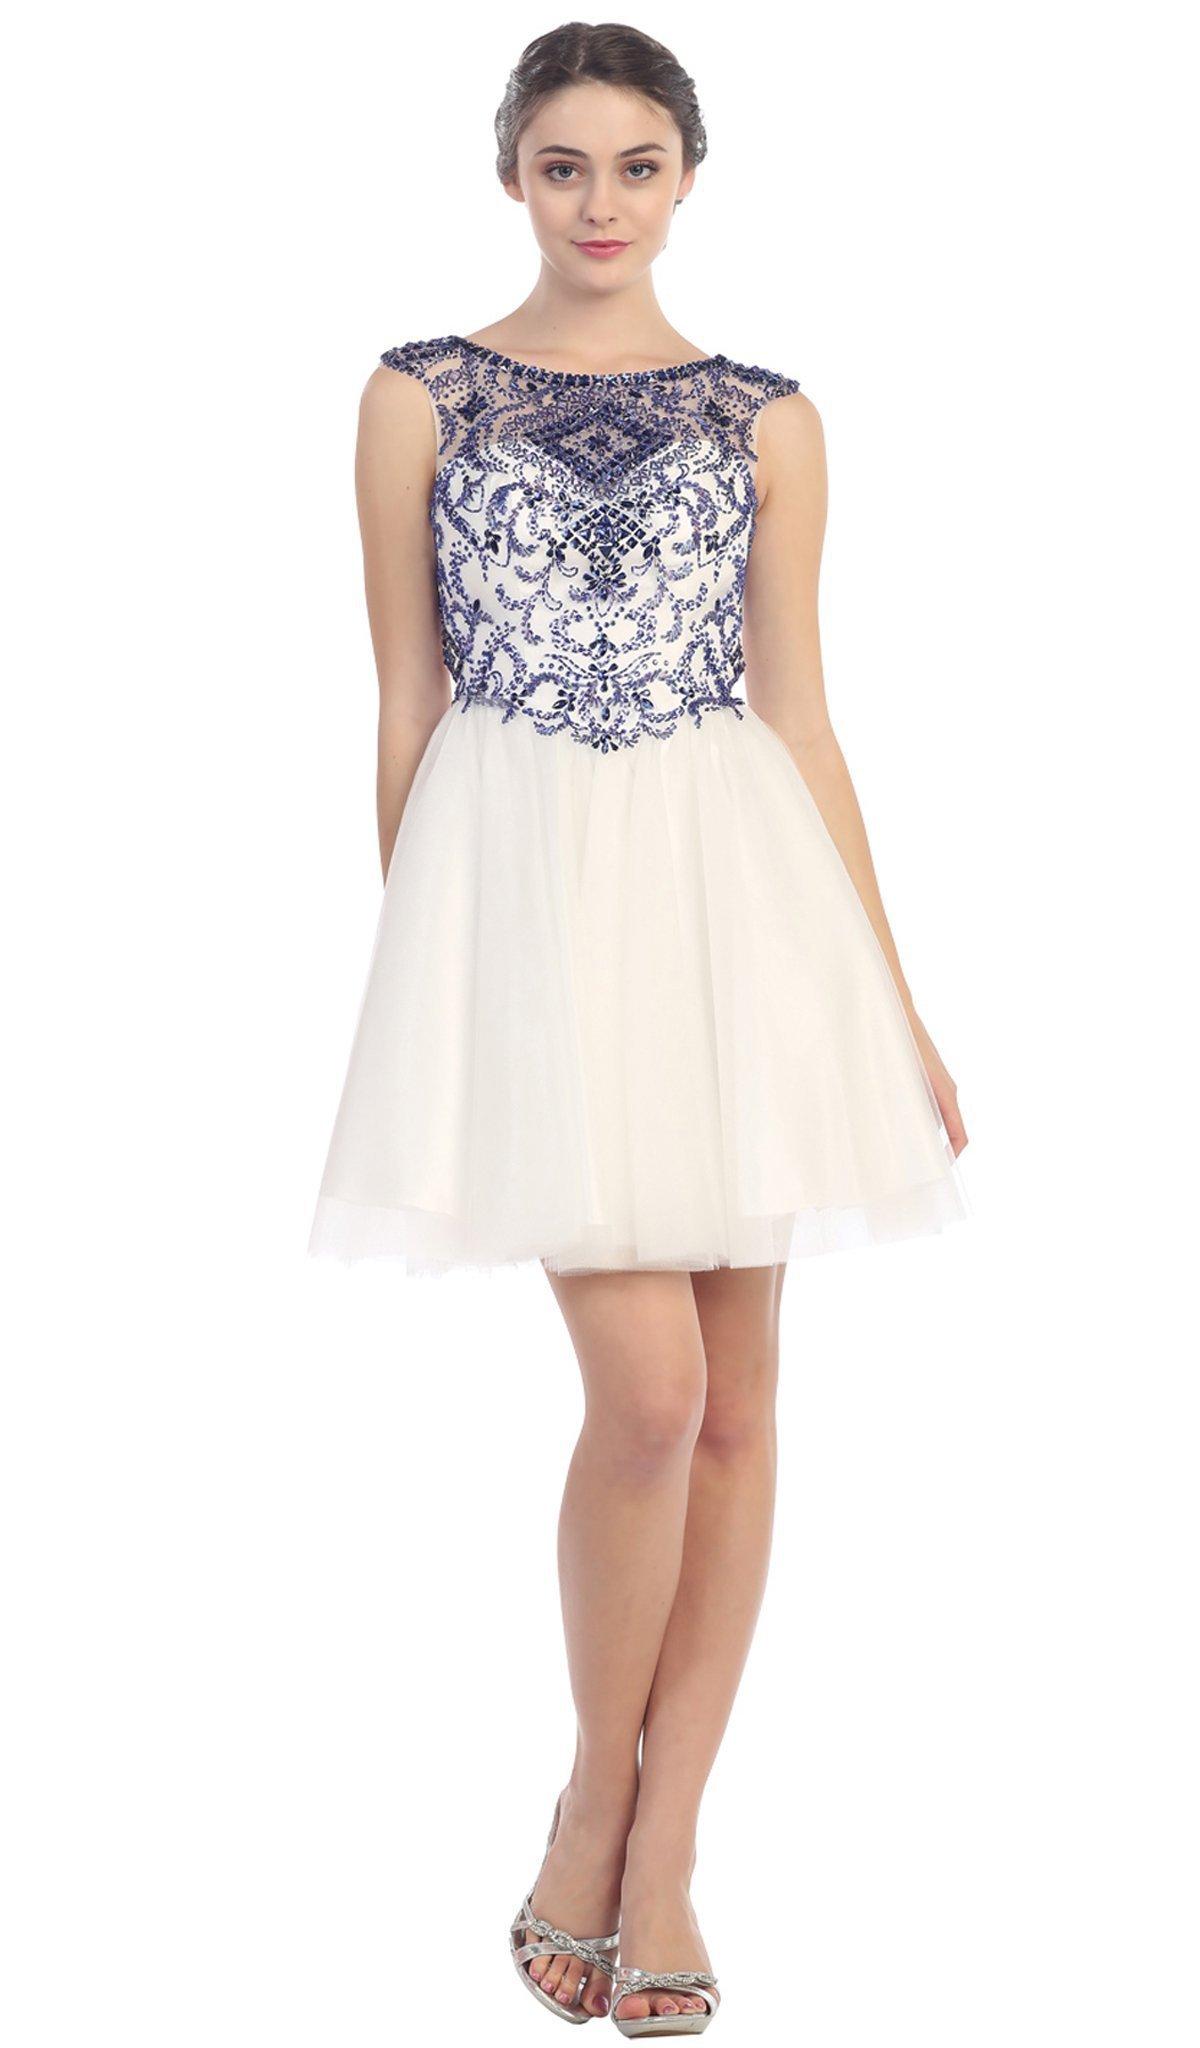 Eureka Fashion - Crystal Embellished Sheer Cocktail Dress